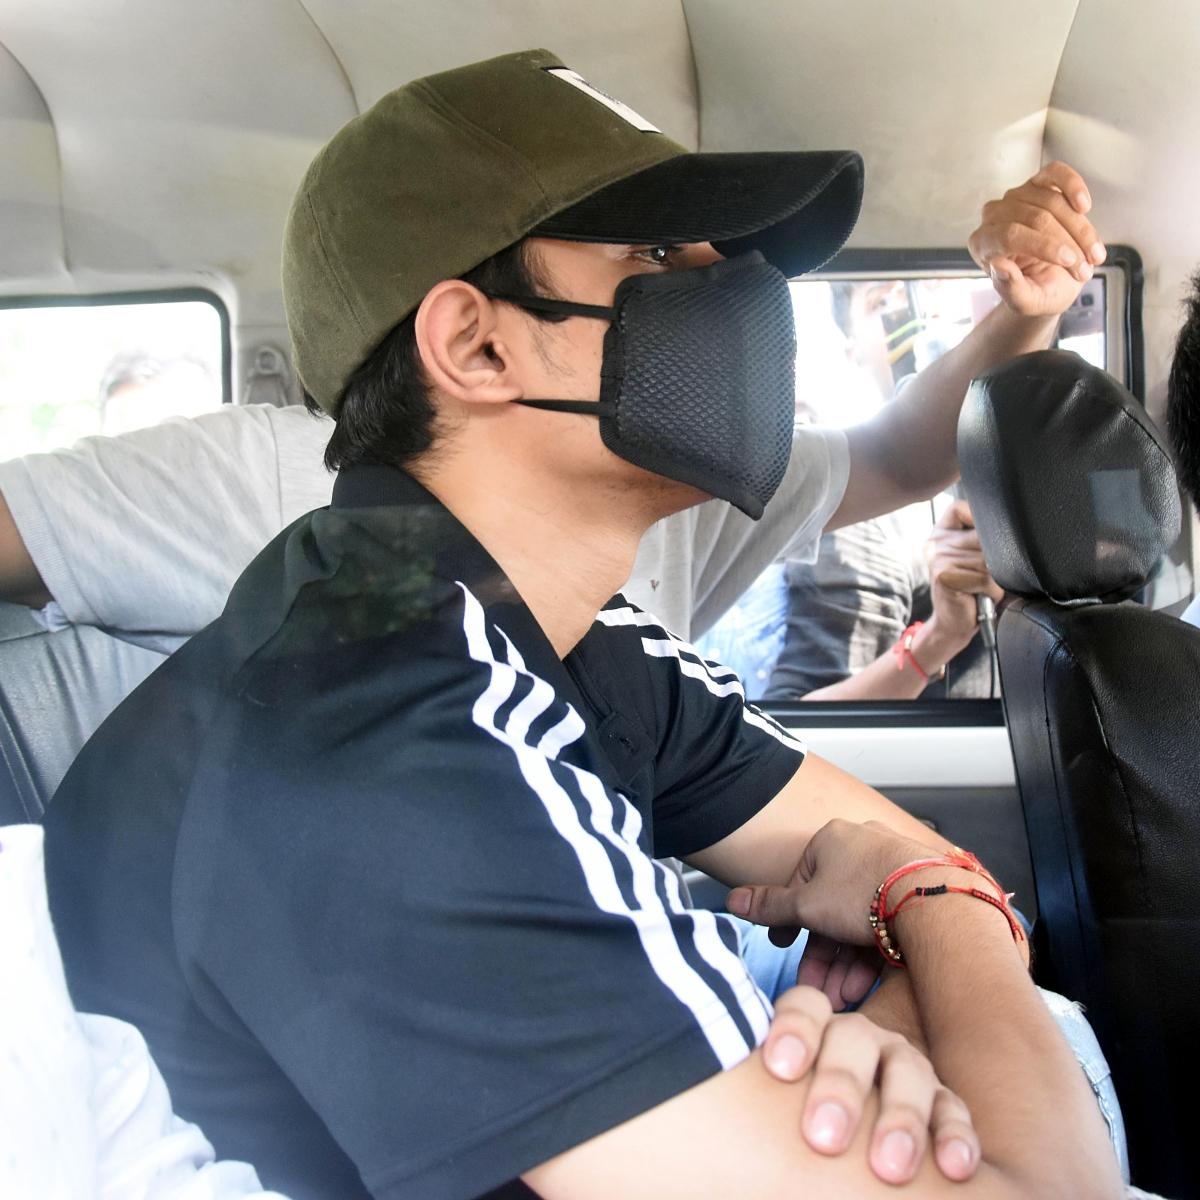 NCB arrests Showik Chakraborty, Samuel Miranda; duo taken for medical tests